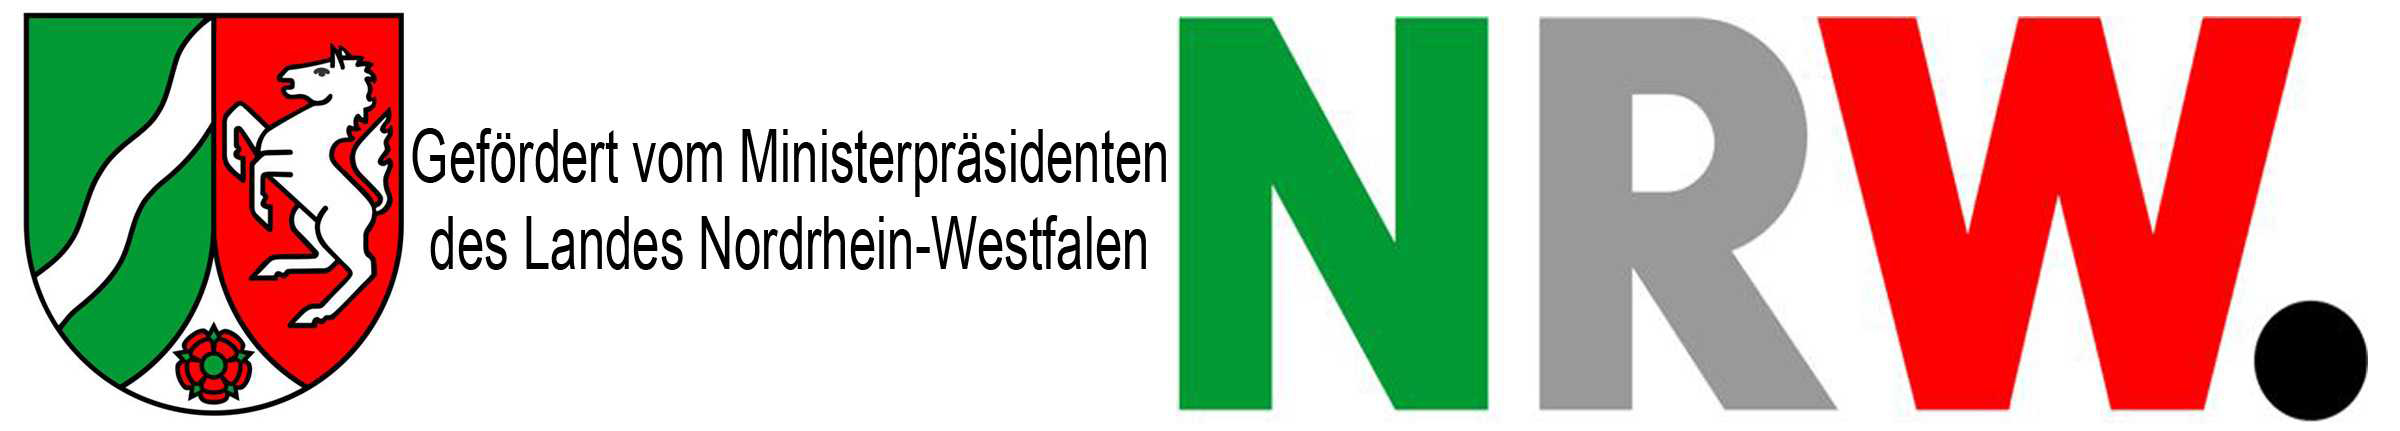 Ministerpräsident NRW.jpg